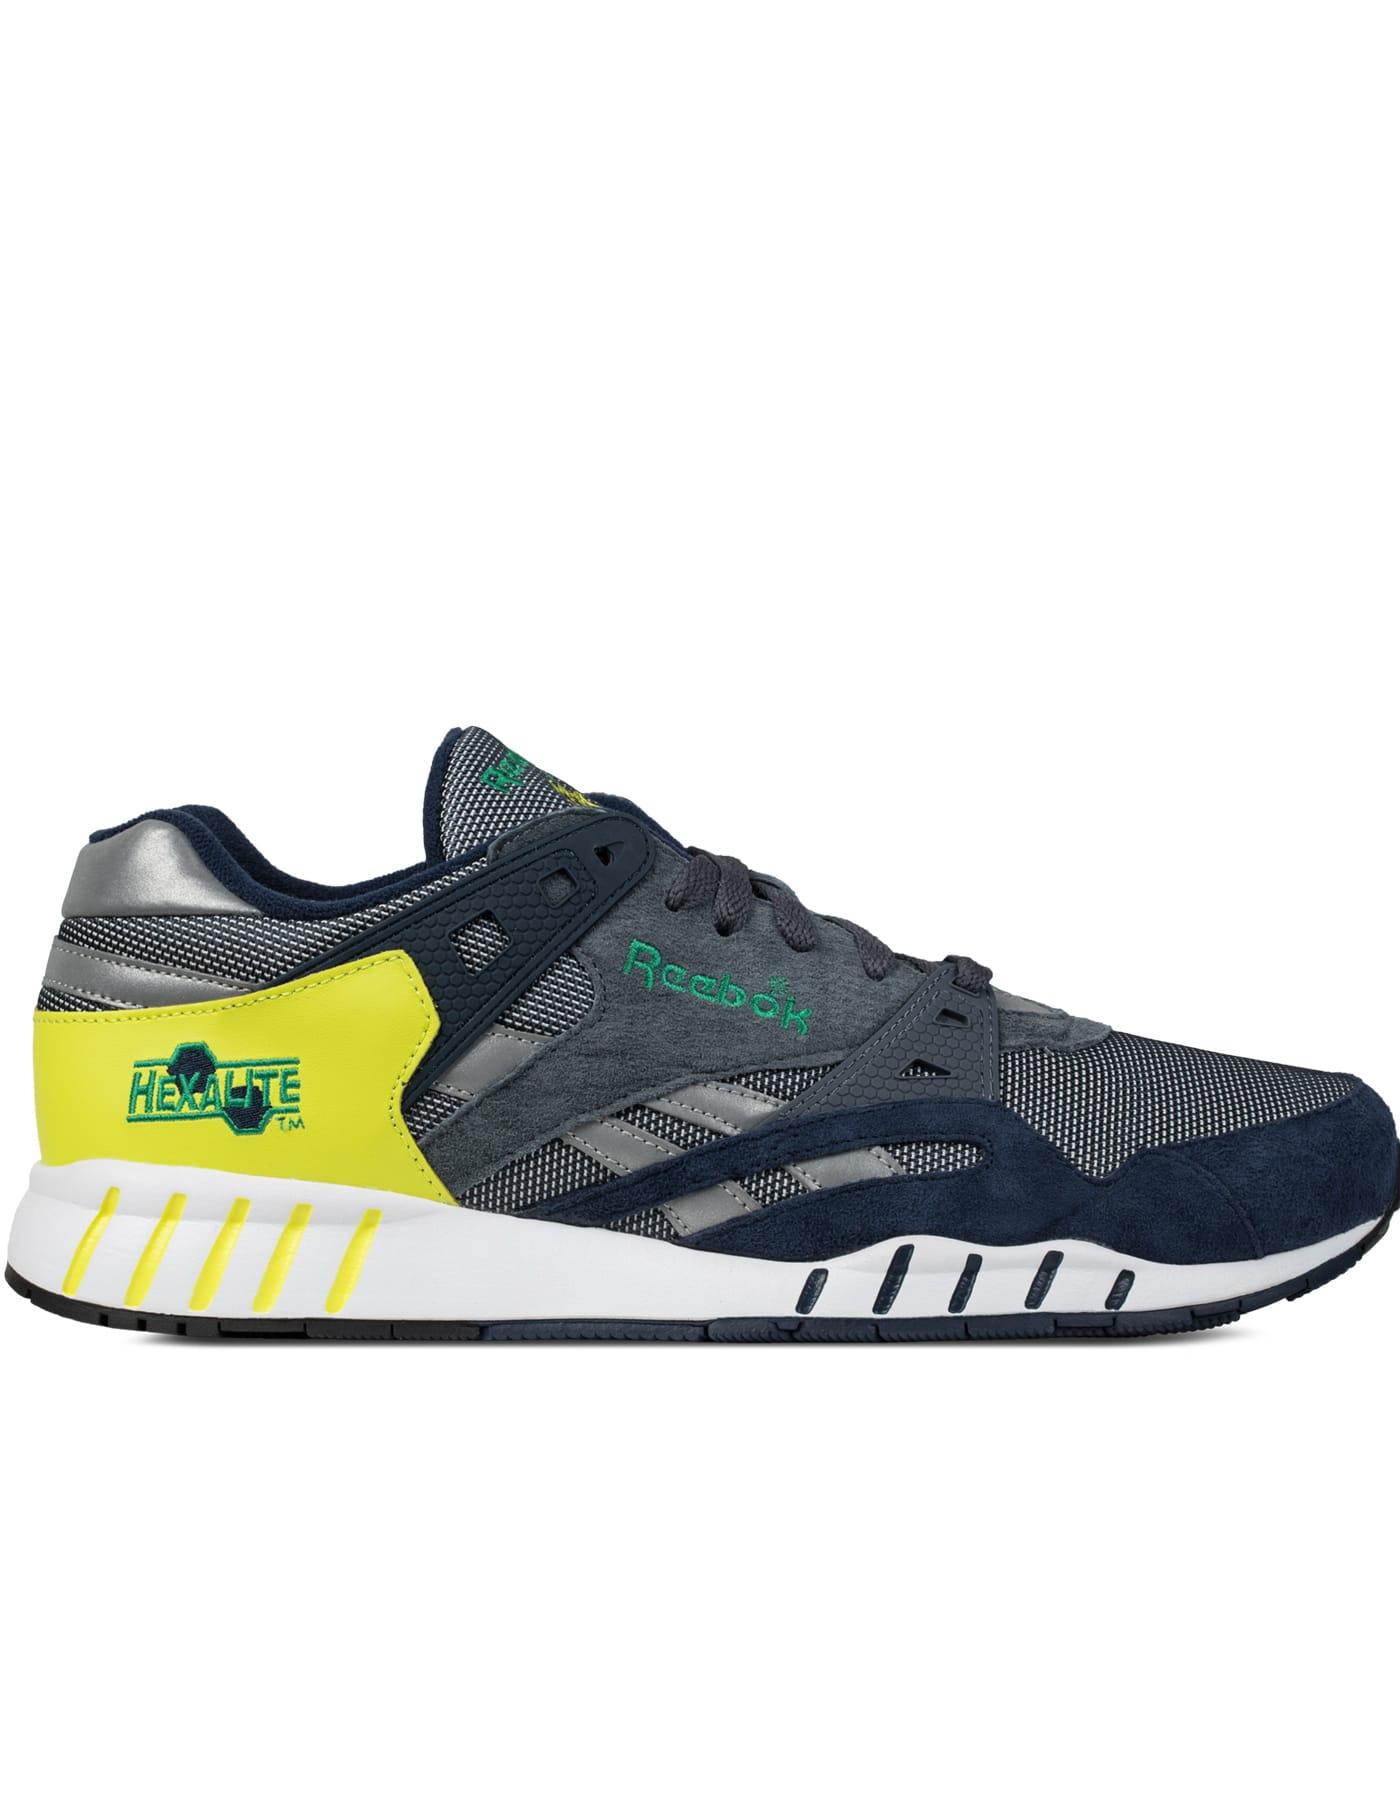 Reebok - Collegiate Navy/Graphite/Hyper Green/Green Sole-Trainer Sneakers